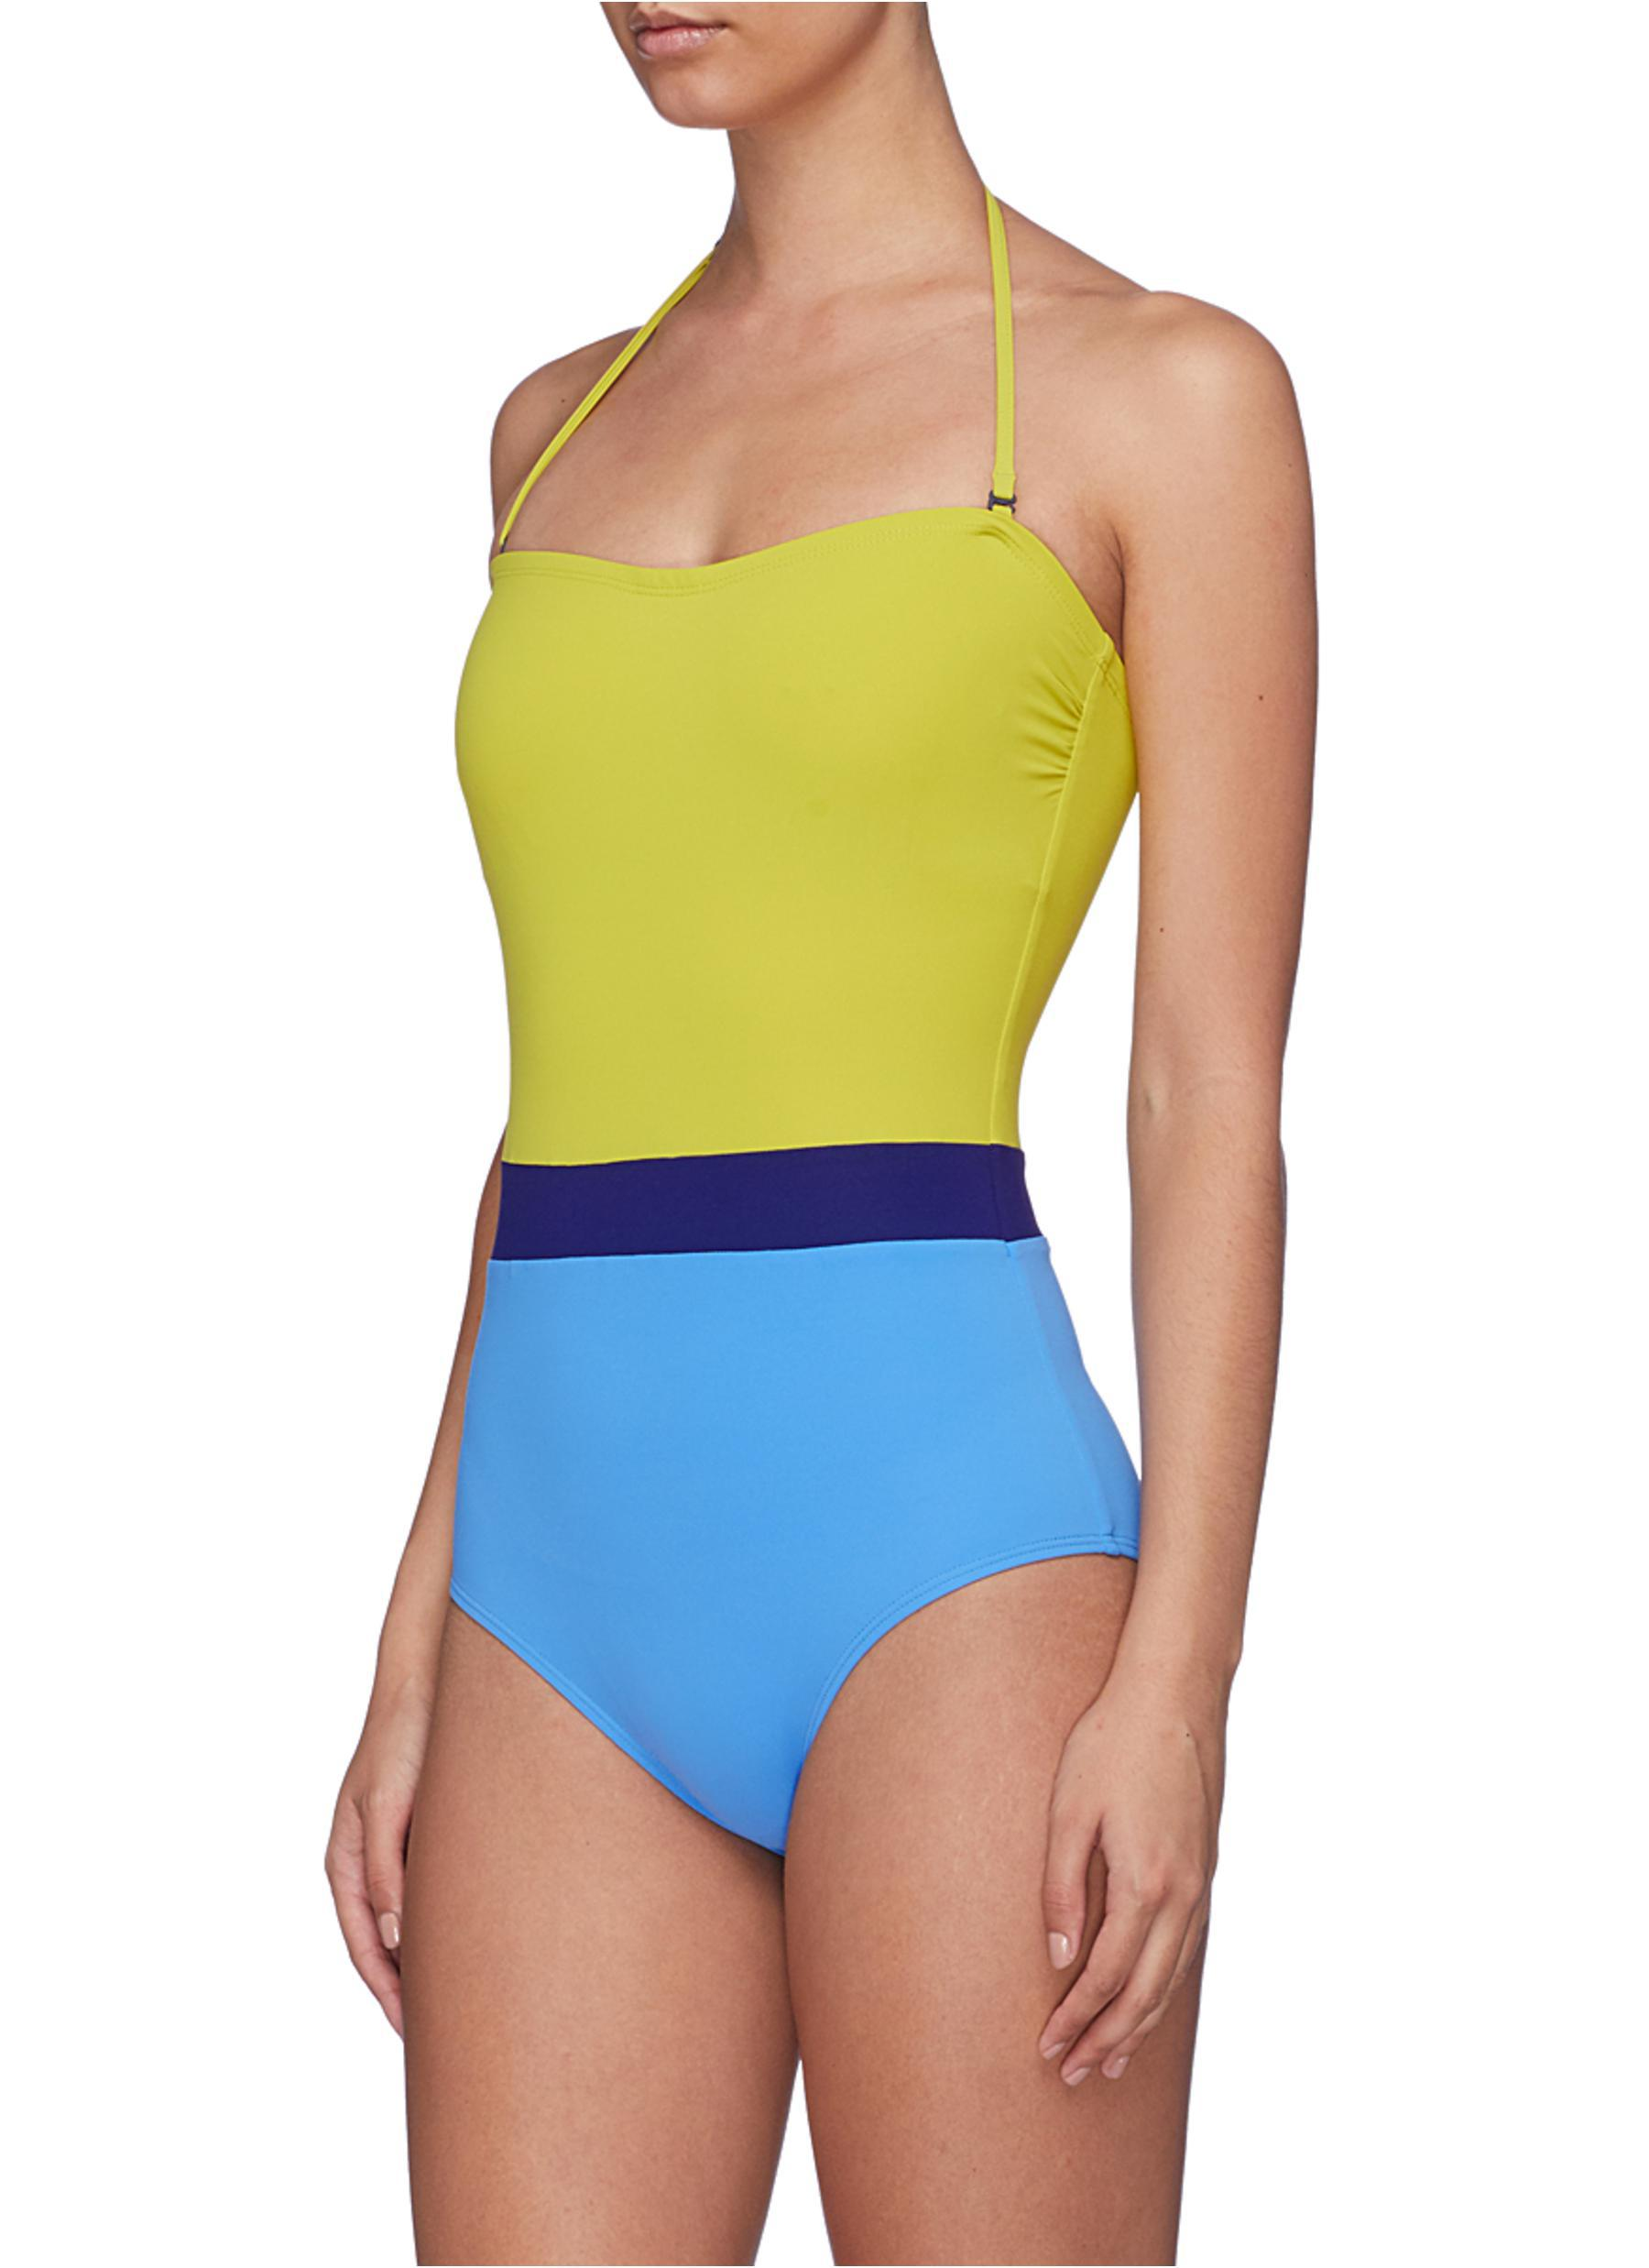 523c56186d0 Flagpole Swim 'rita' Colourblock Halterneck One-piece Swimsuit in ...